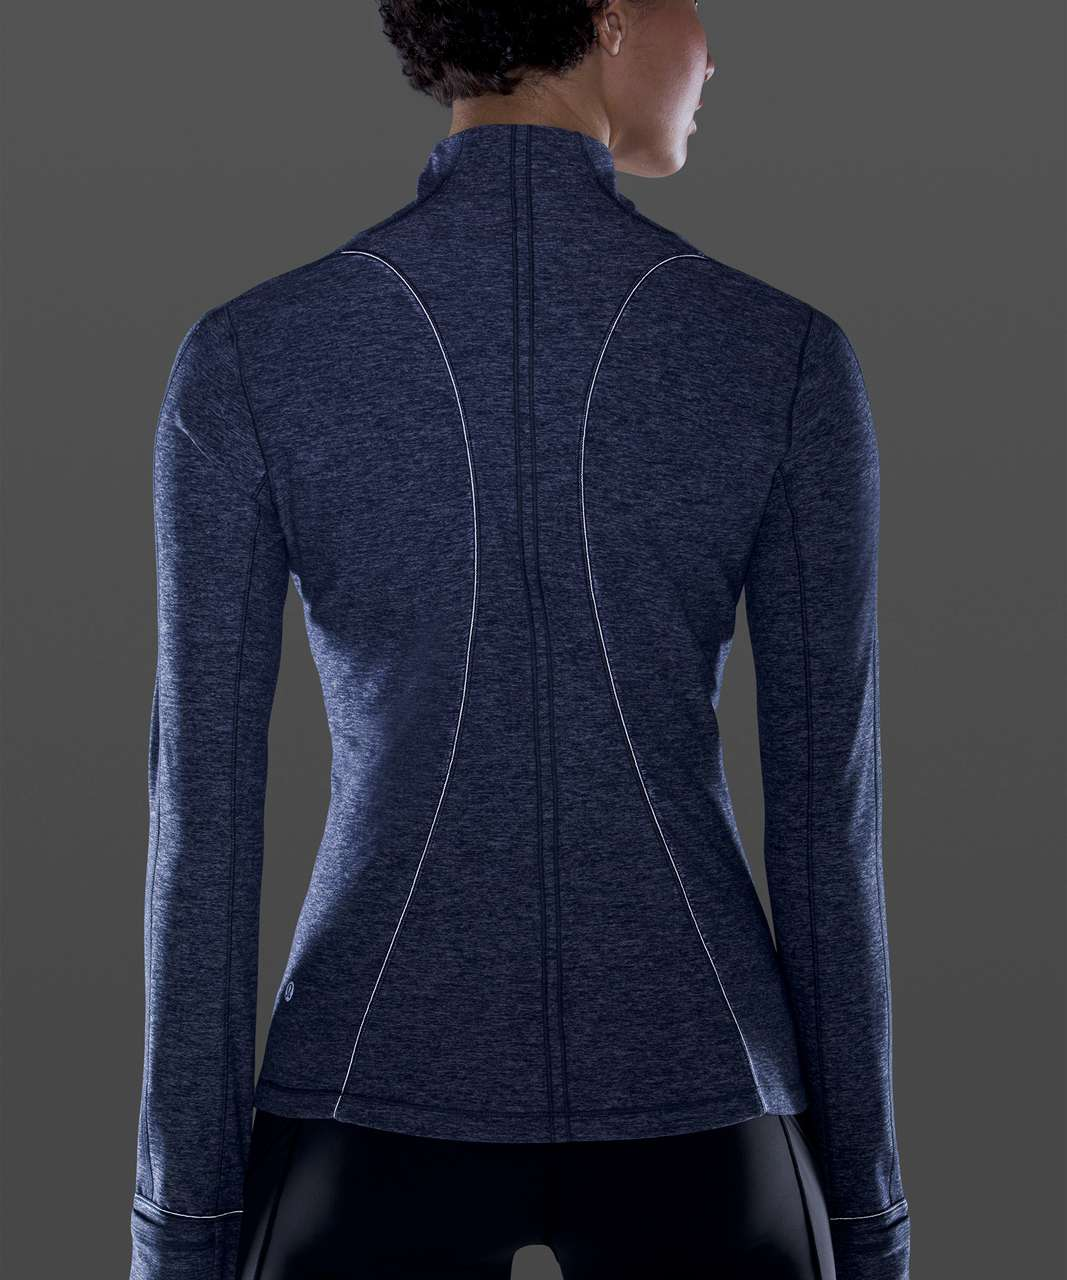 Lululemon Run Briskly 1/2 Zip - Heathered Cadet Blue